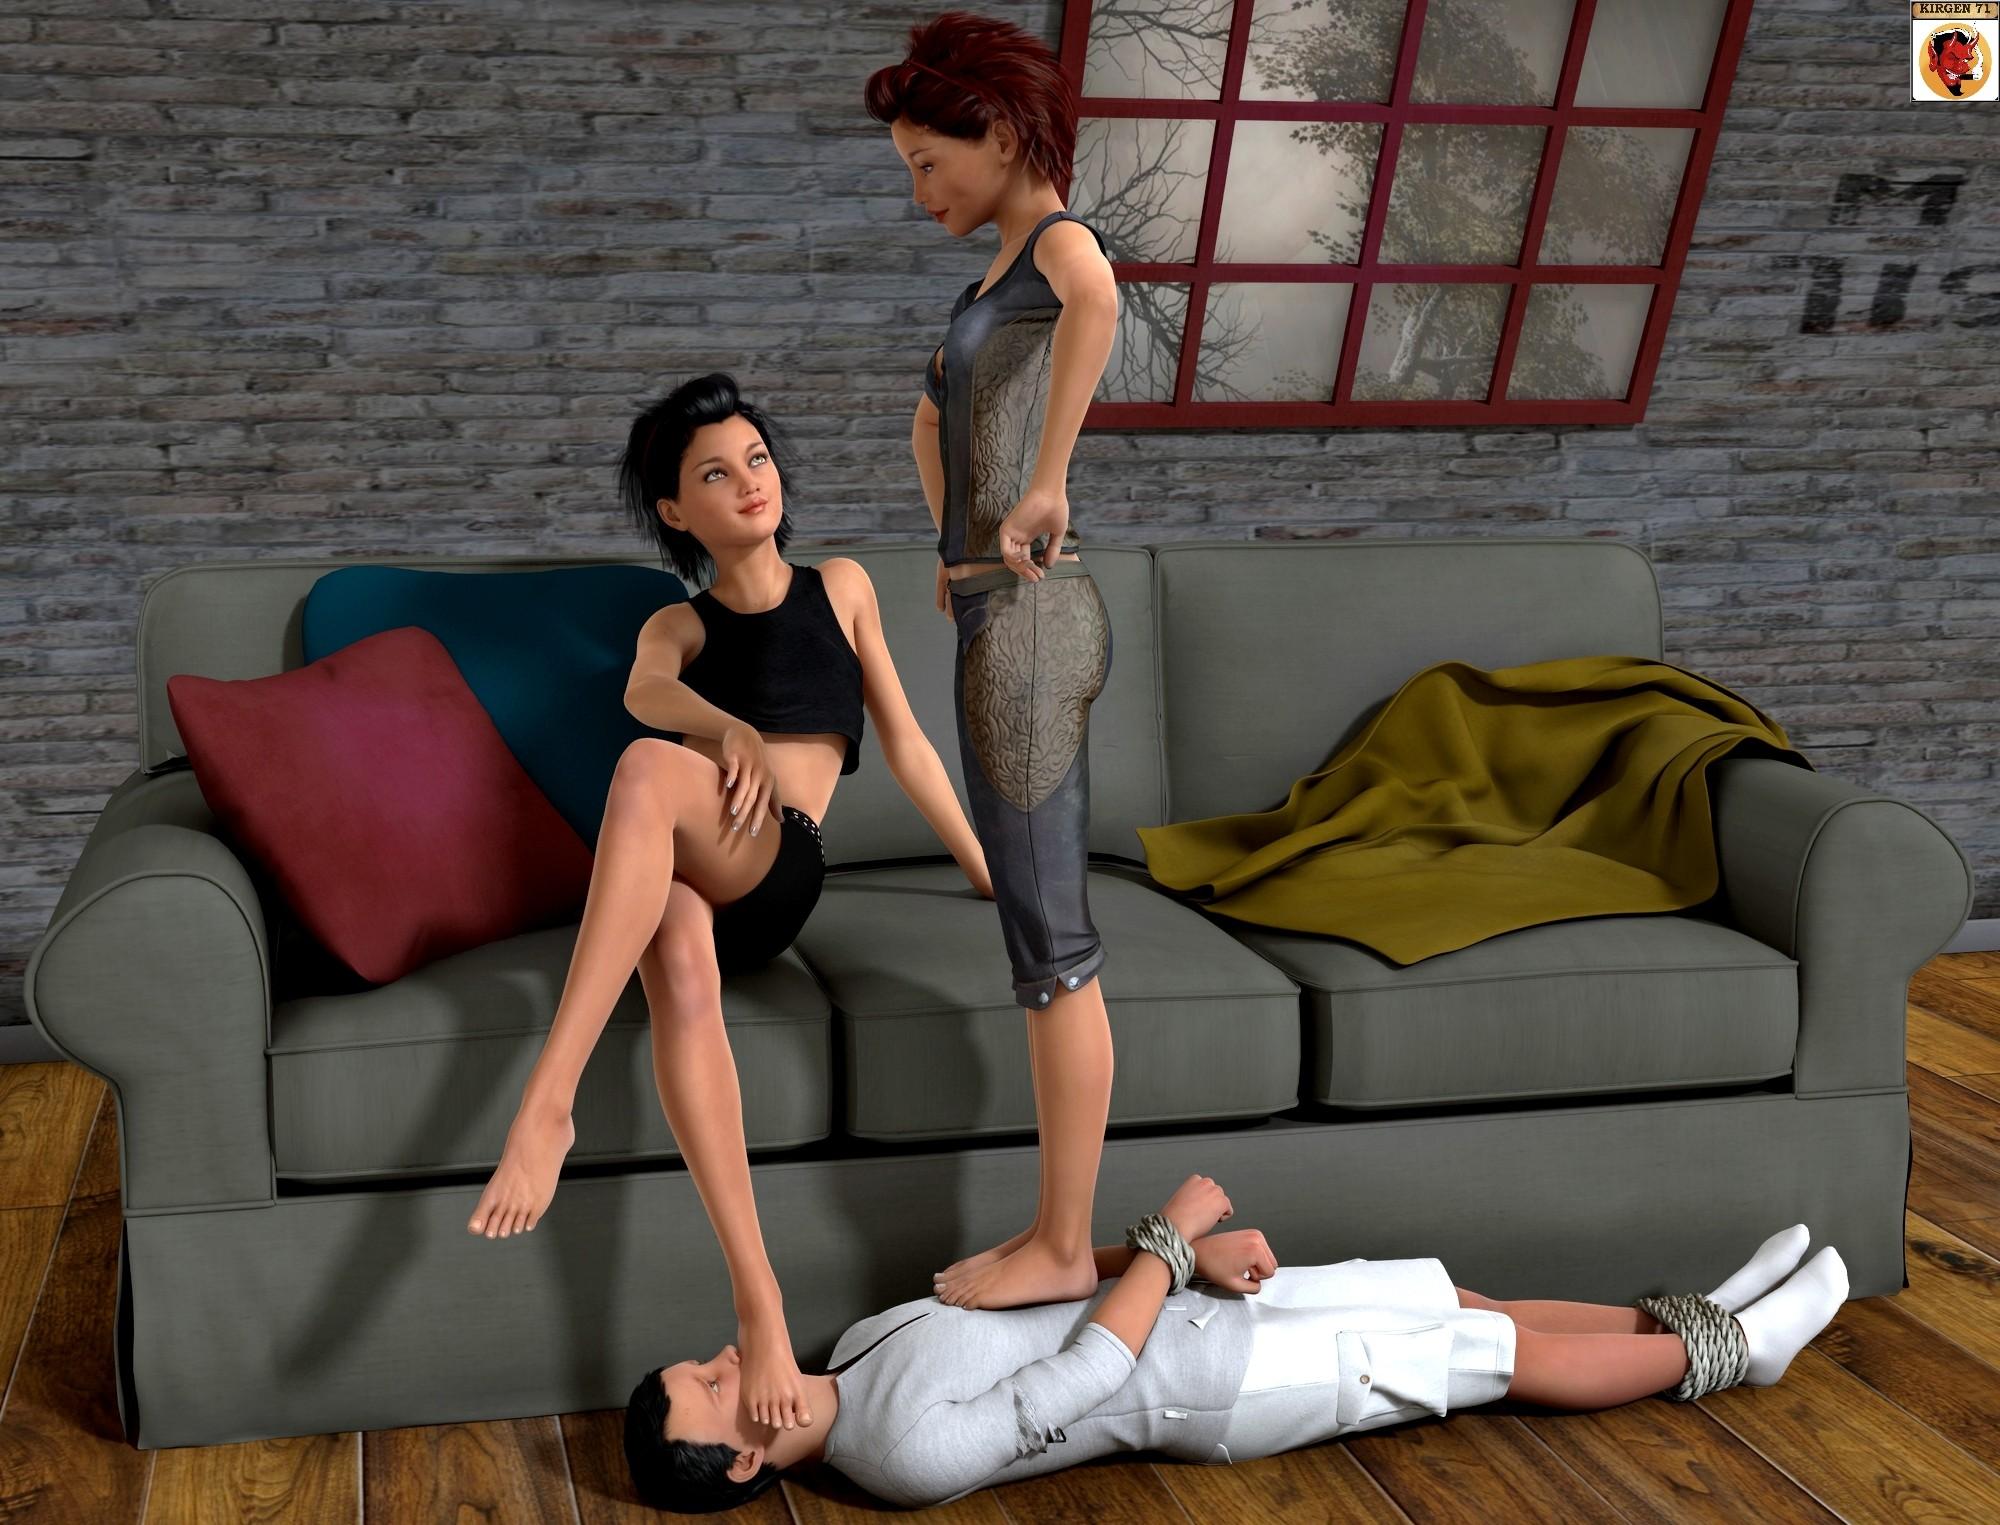 femdom-digital-art-4-14